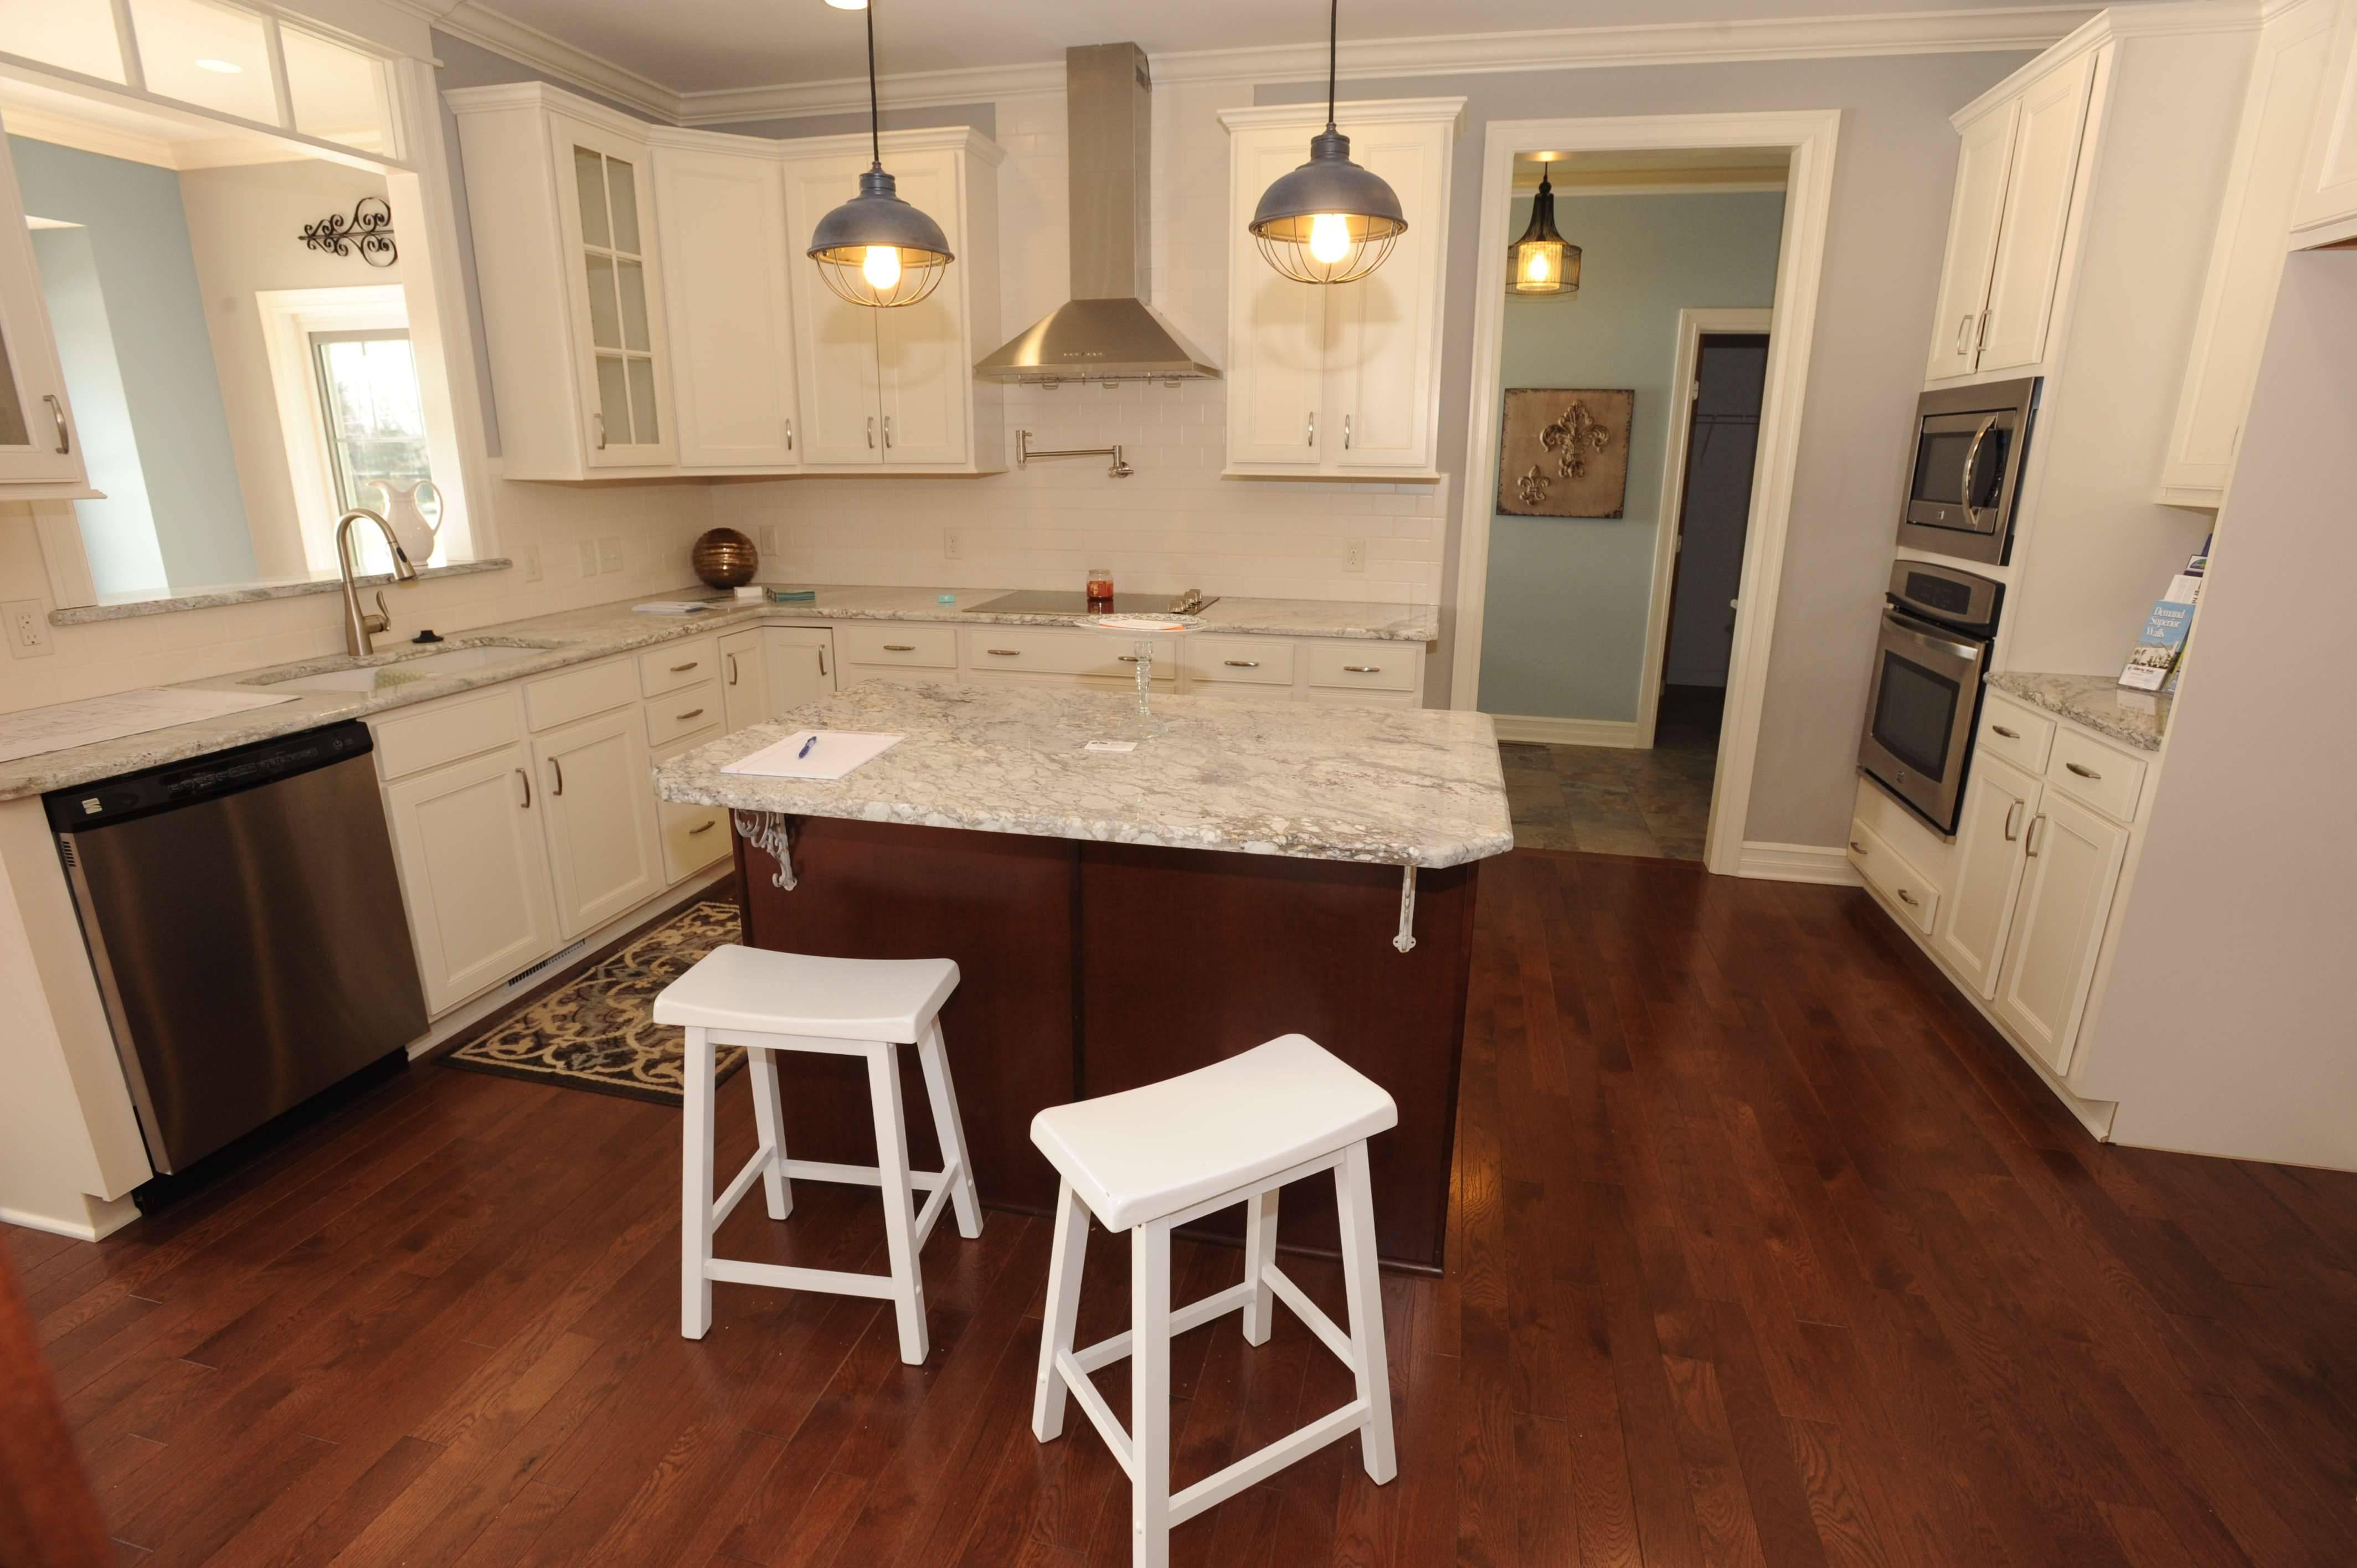 Kitchen Design Using Shaped Layout Island Cabinets Huz